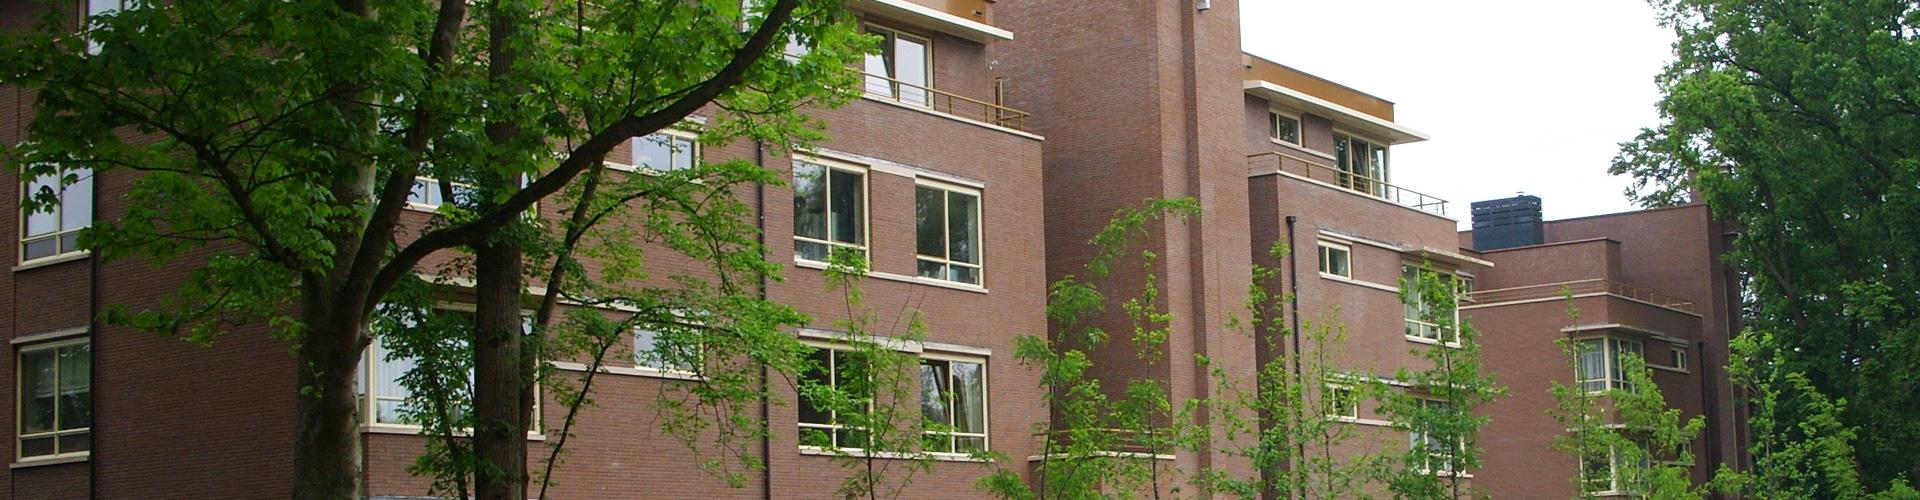 Hestiahof appartementen